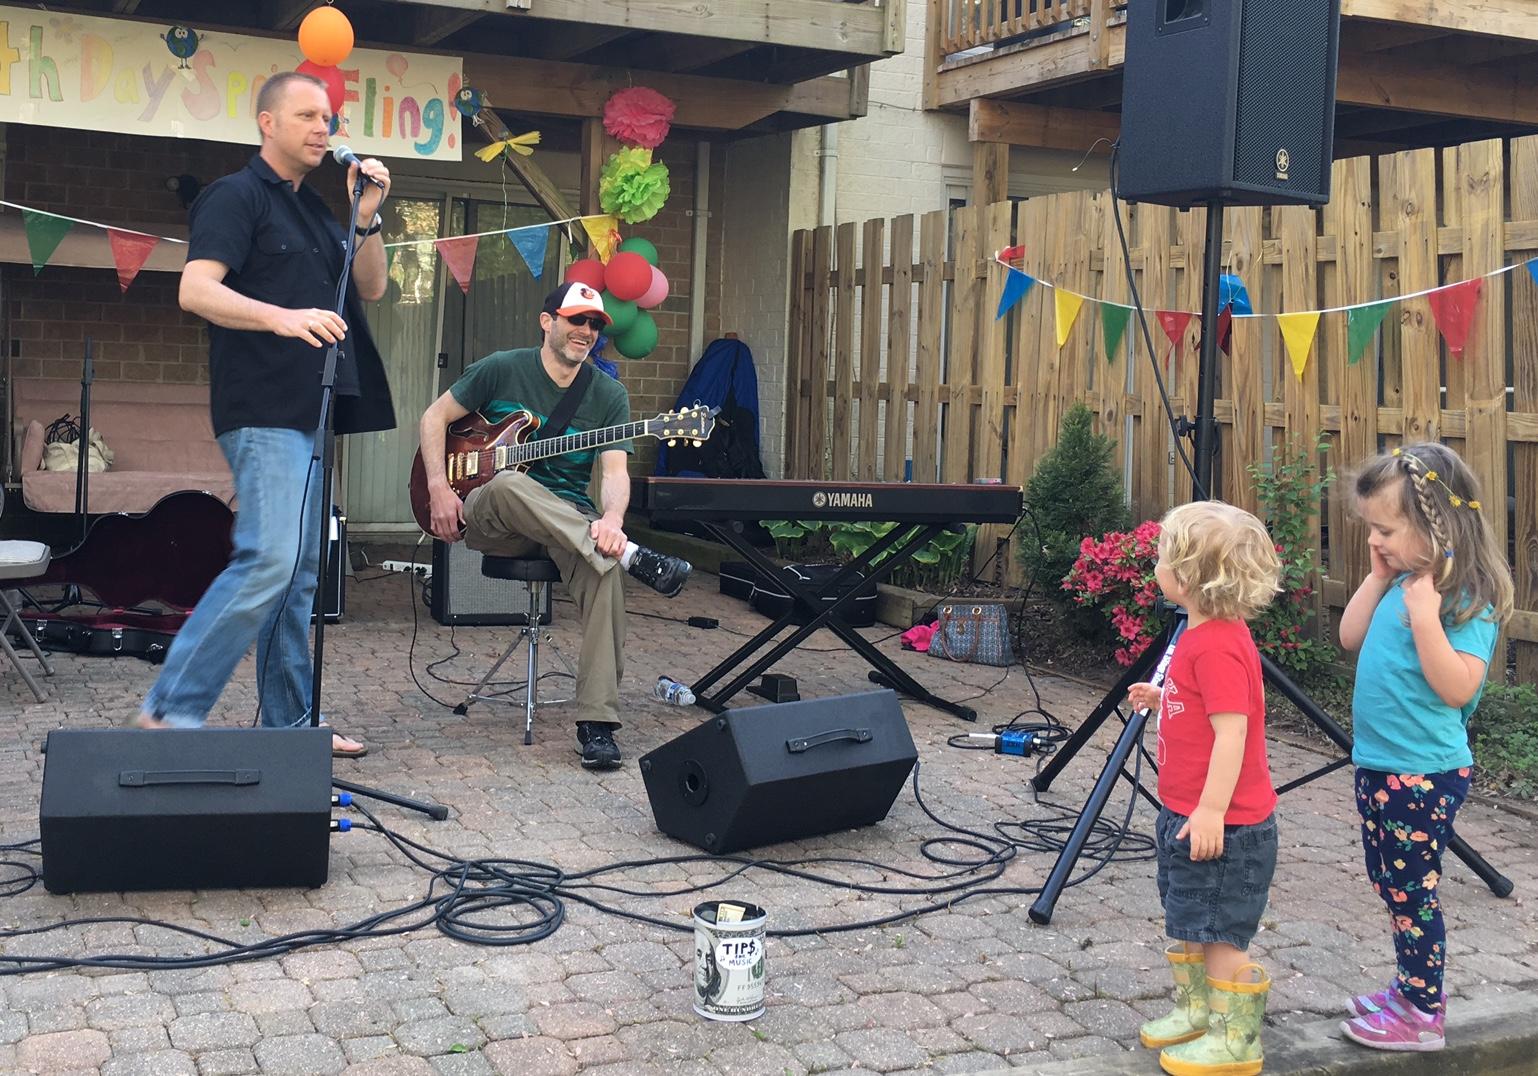 Mini fans of resident musicians!